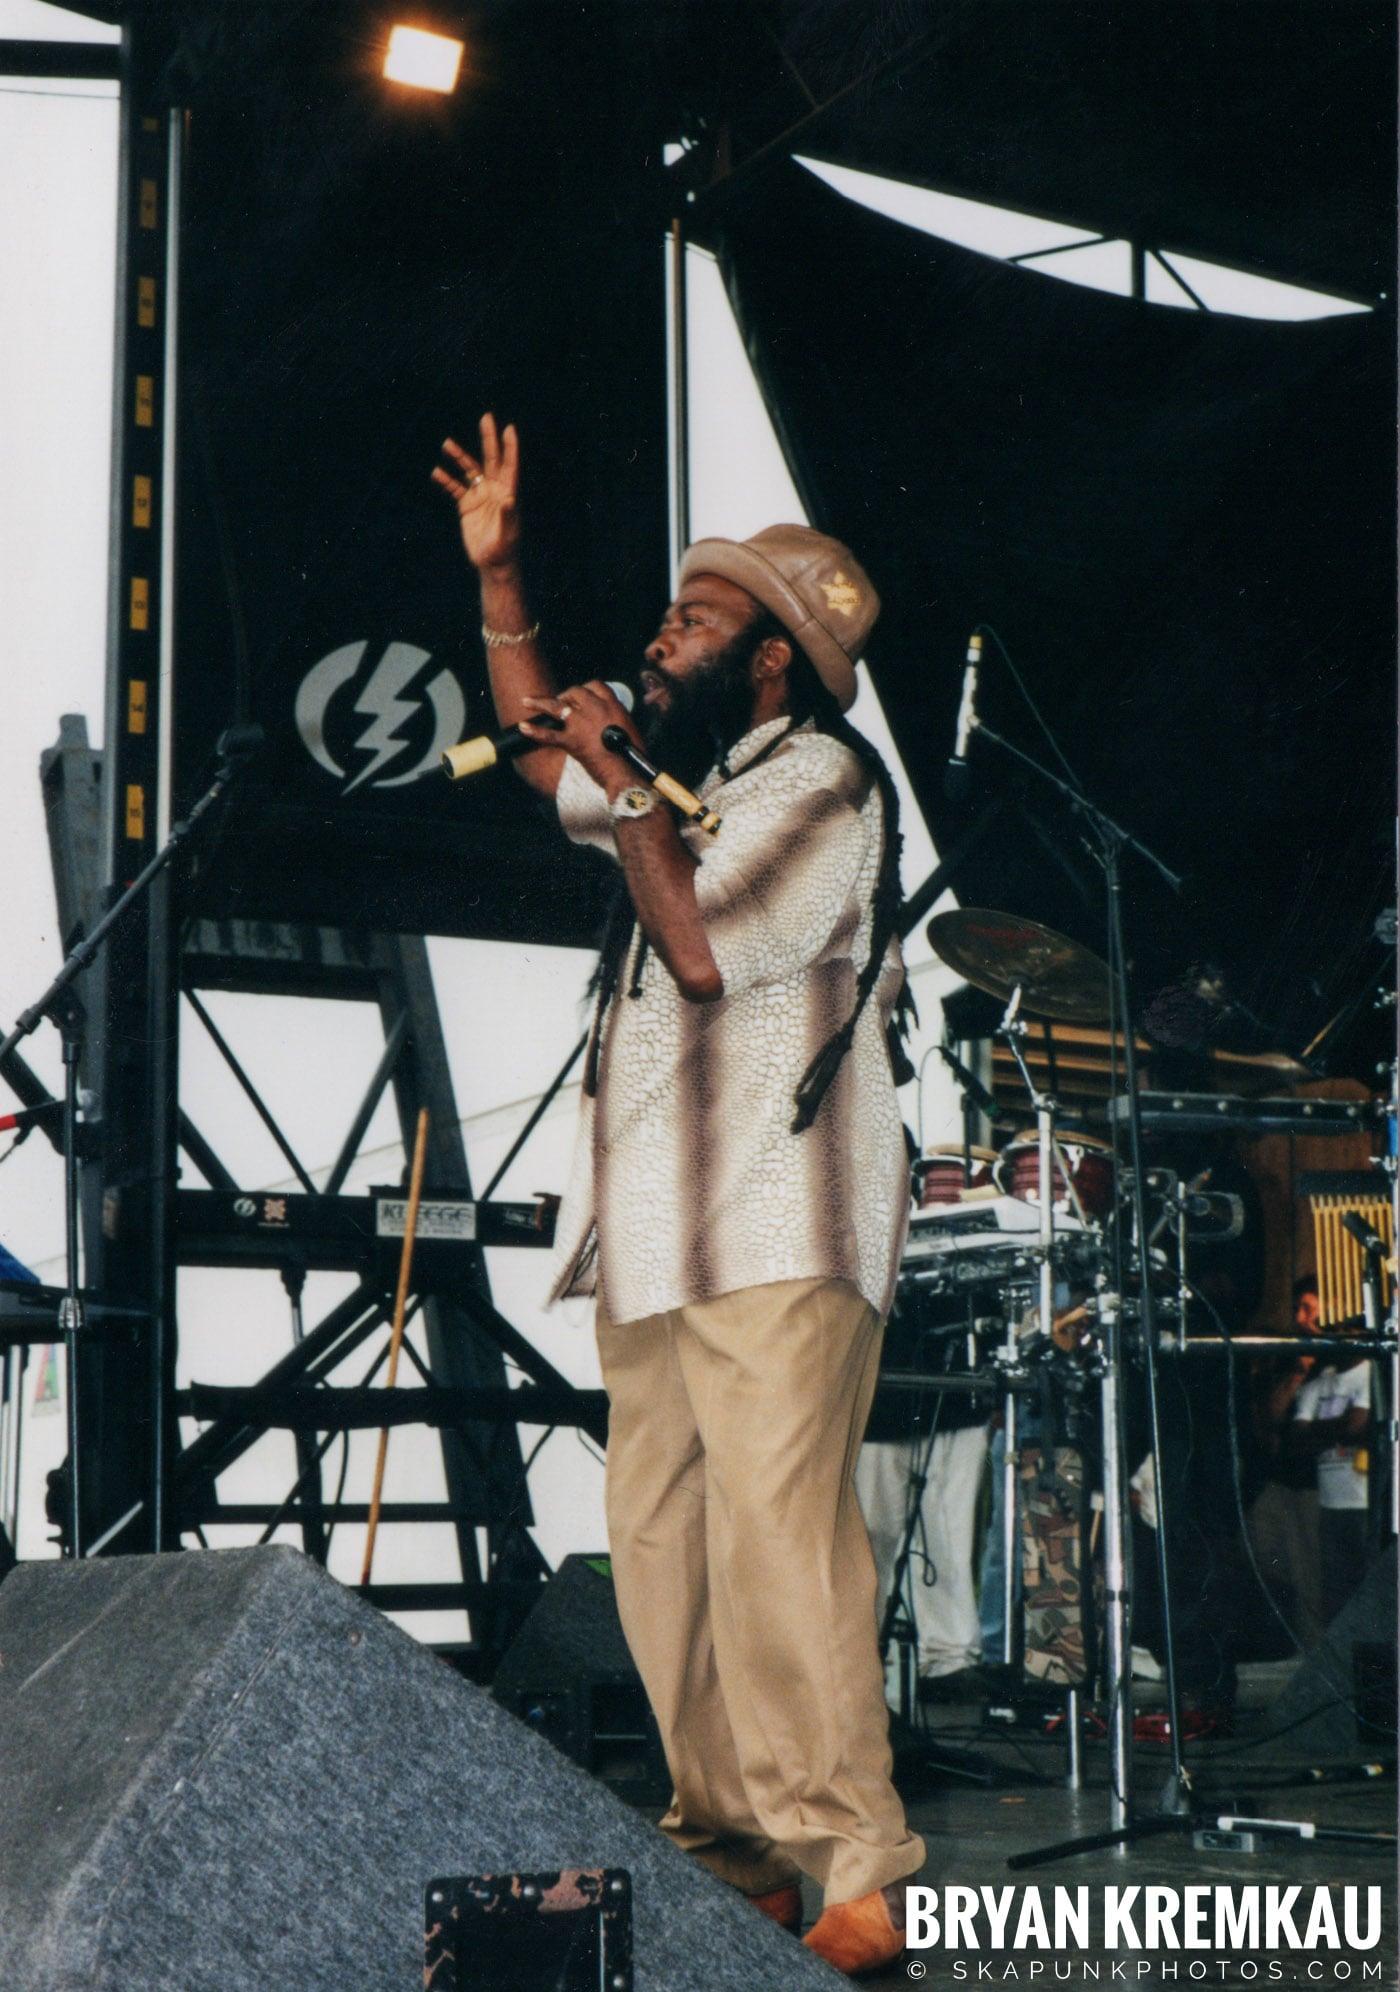 Morgan Heritage @ Vans Warped Tour, Randall's Island, NYC - 8.4.01 (10)